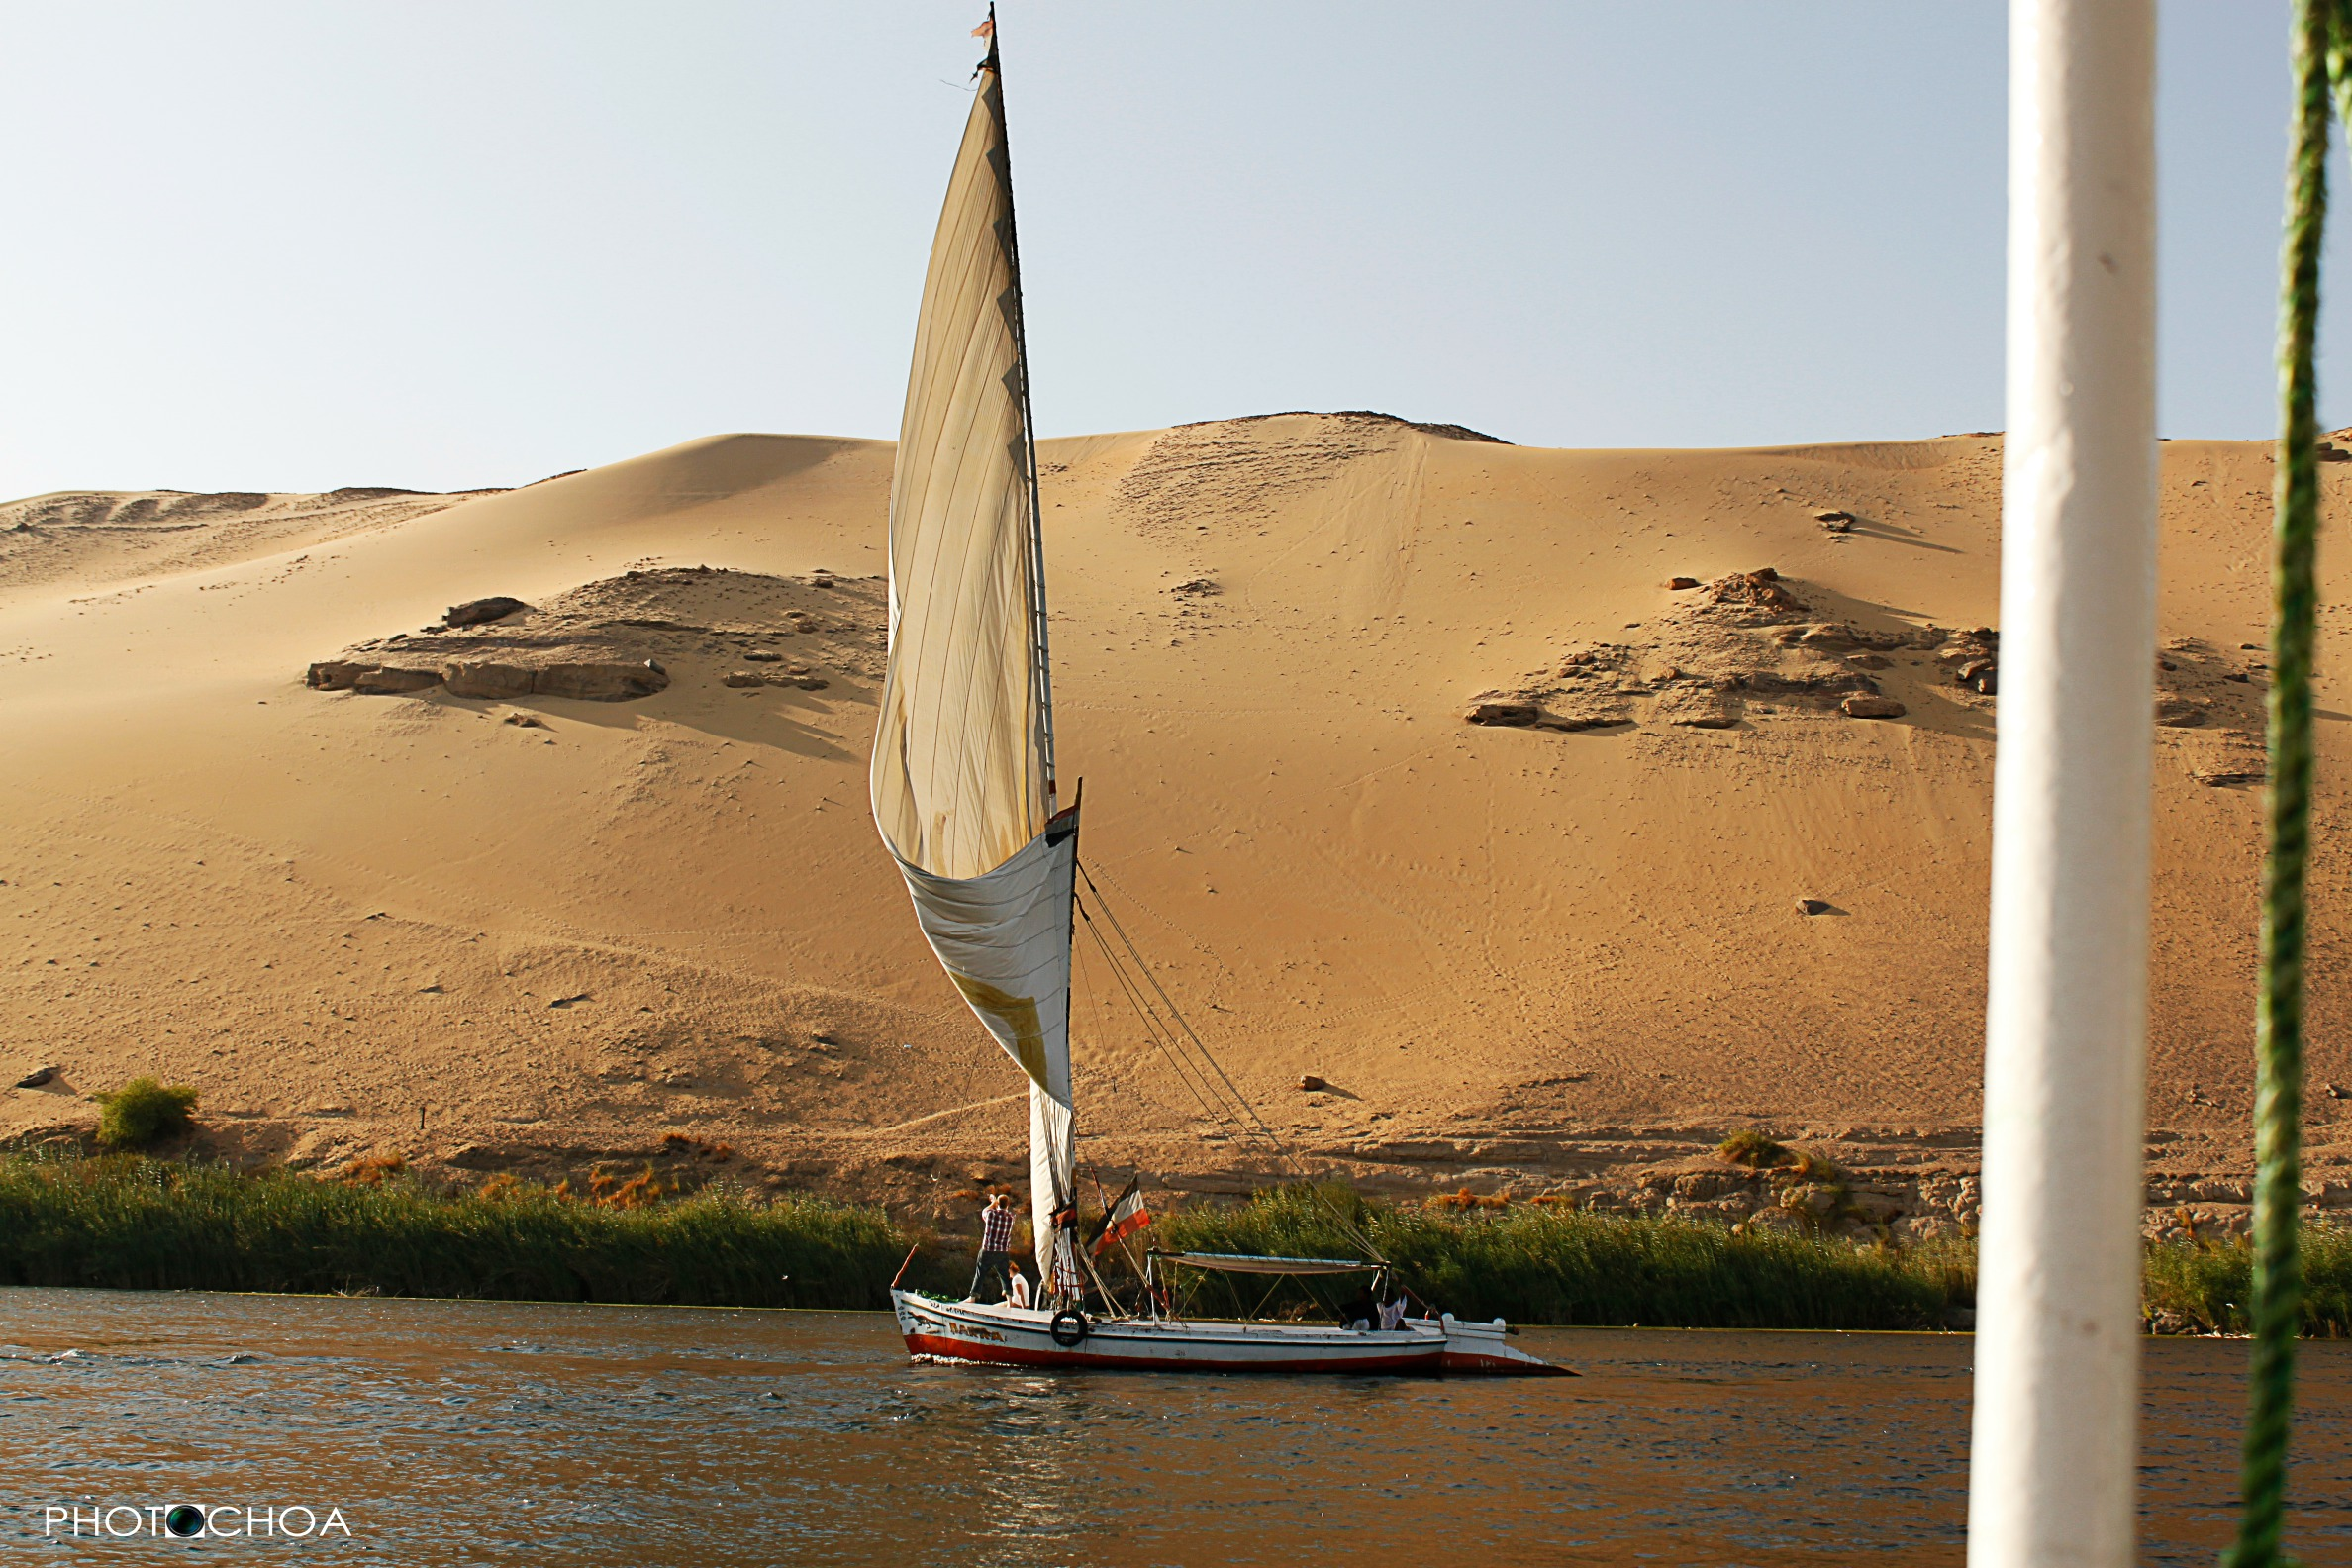 Río Nilo PHOTOCHOA